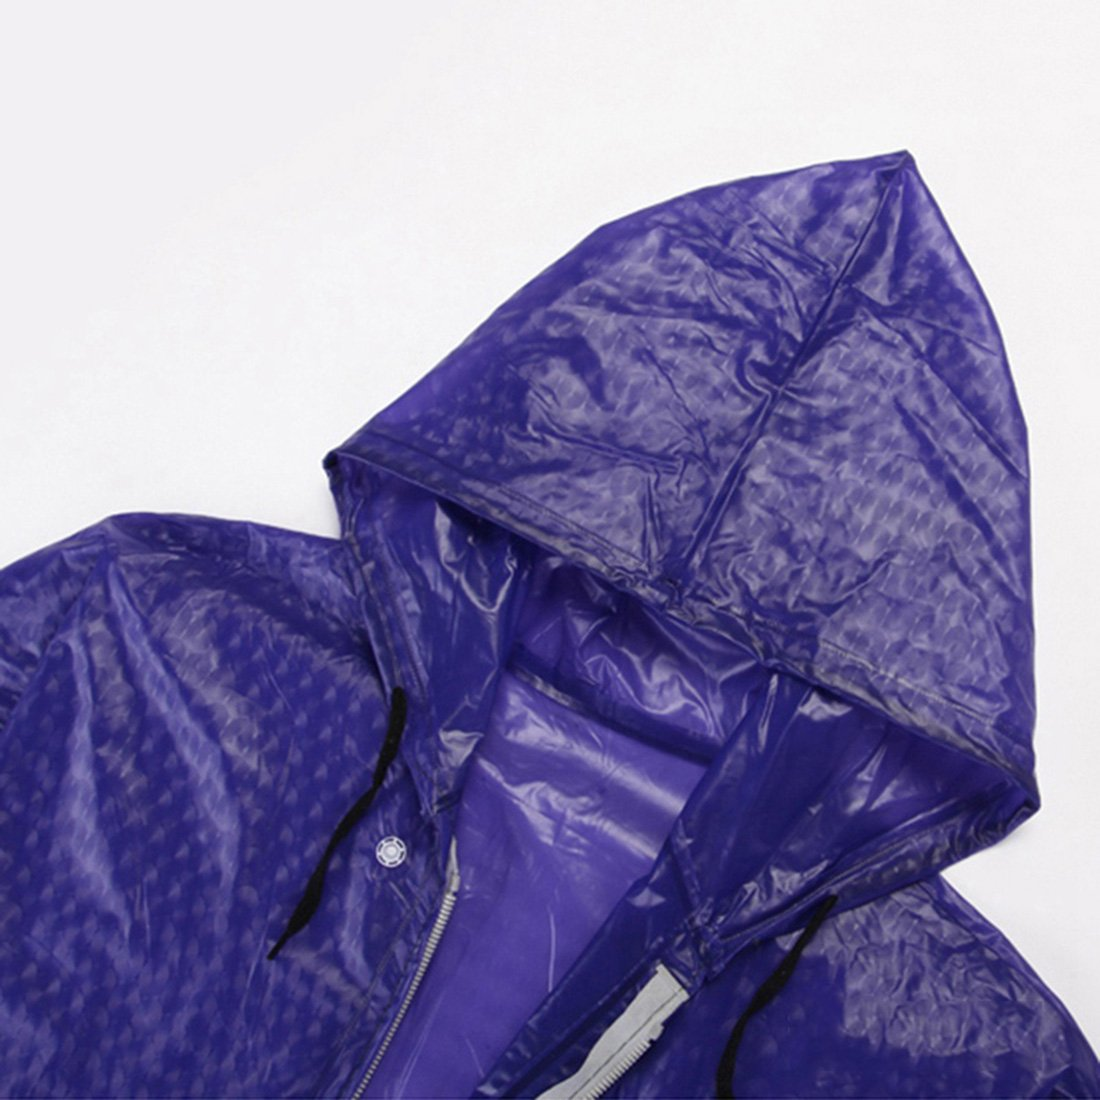 Freahap Regenmantel Raincoat Regenponcho Regenmantelanzug Erwachsene Dunkelblau